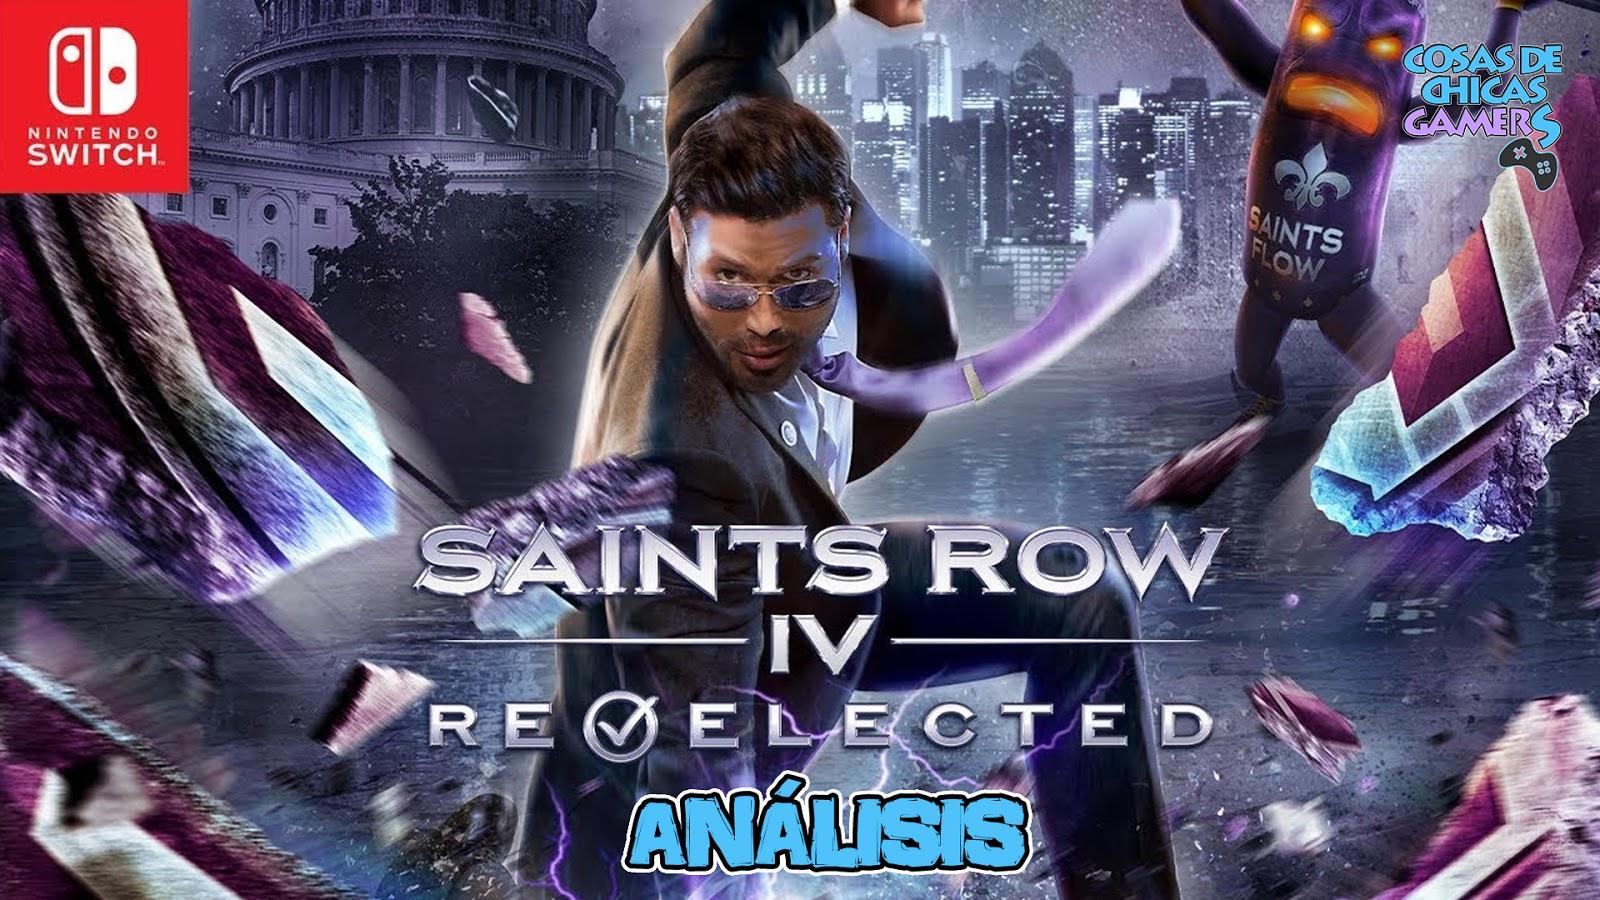 SAINTS ROW IV: RE-ELECTED - ANÁLISIS EN NINTENDO SWITCH